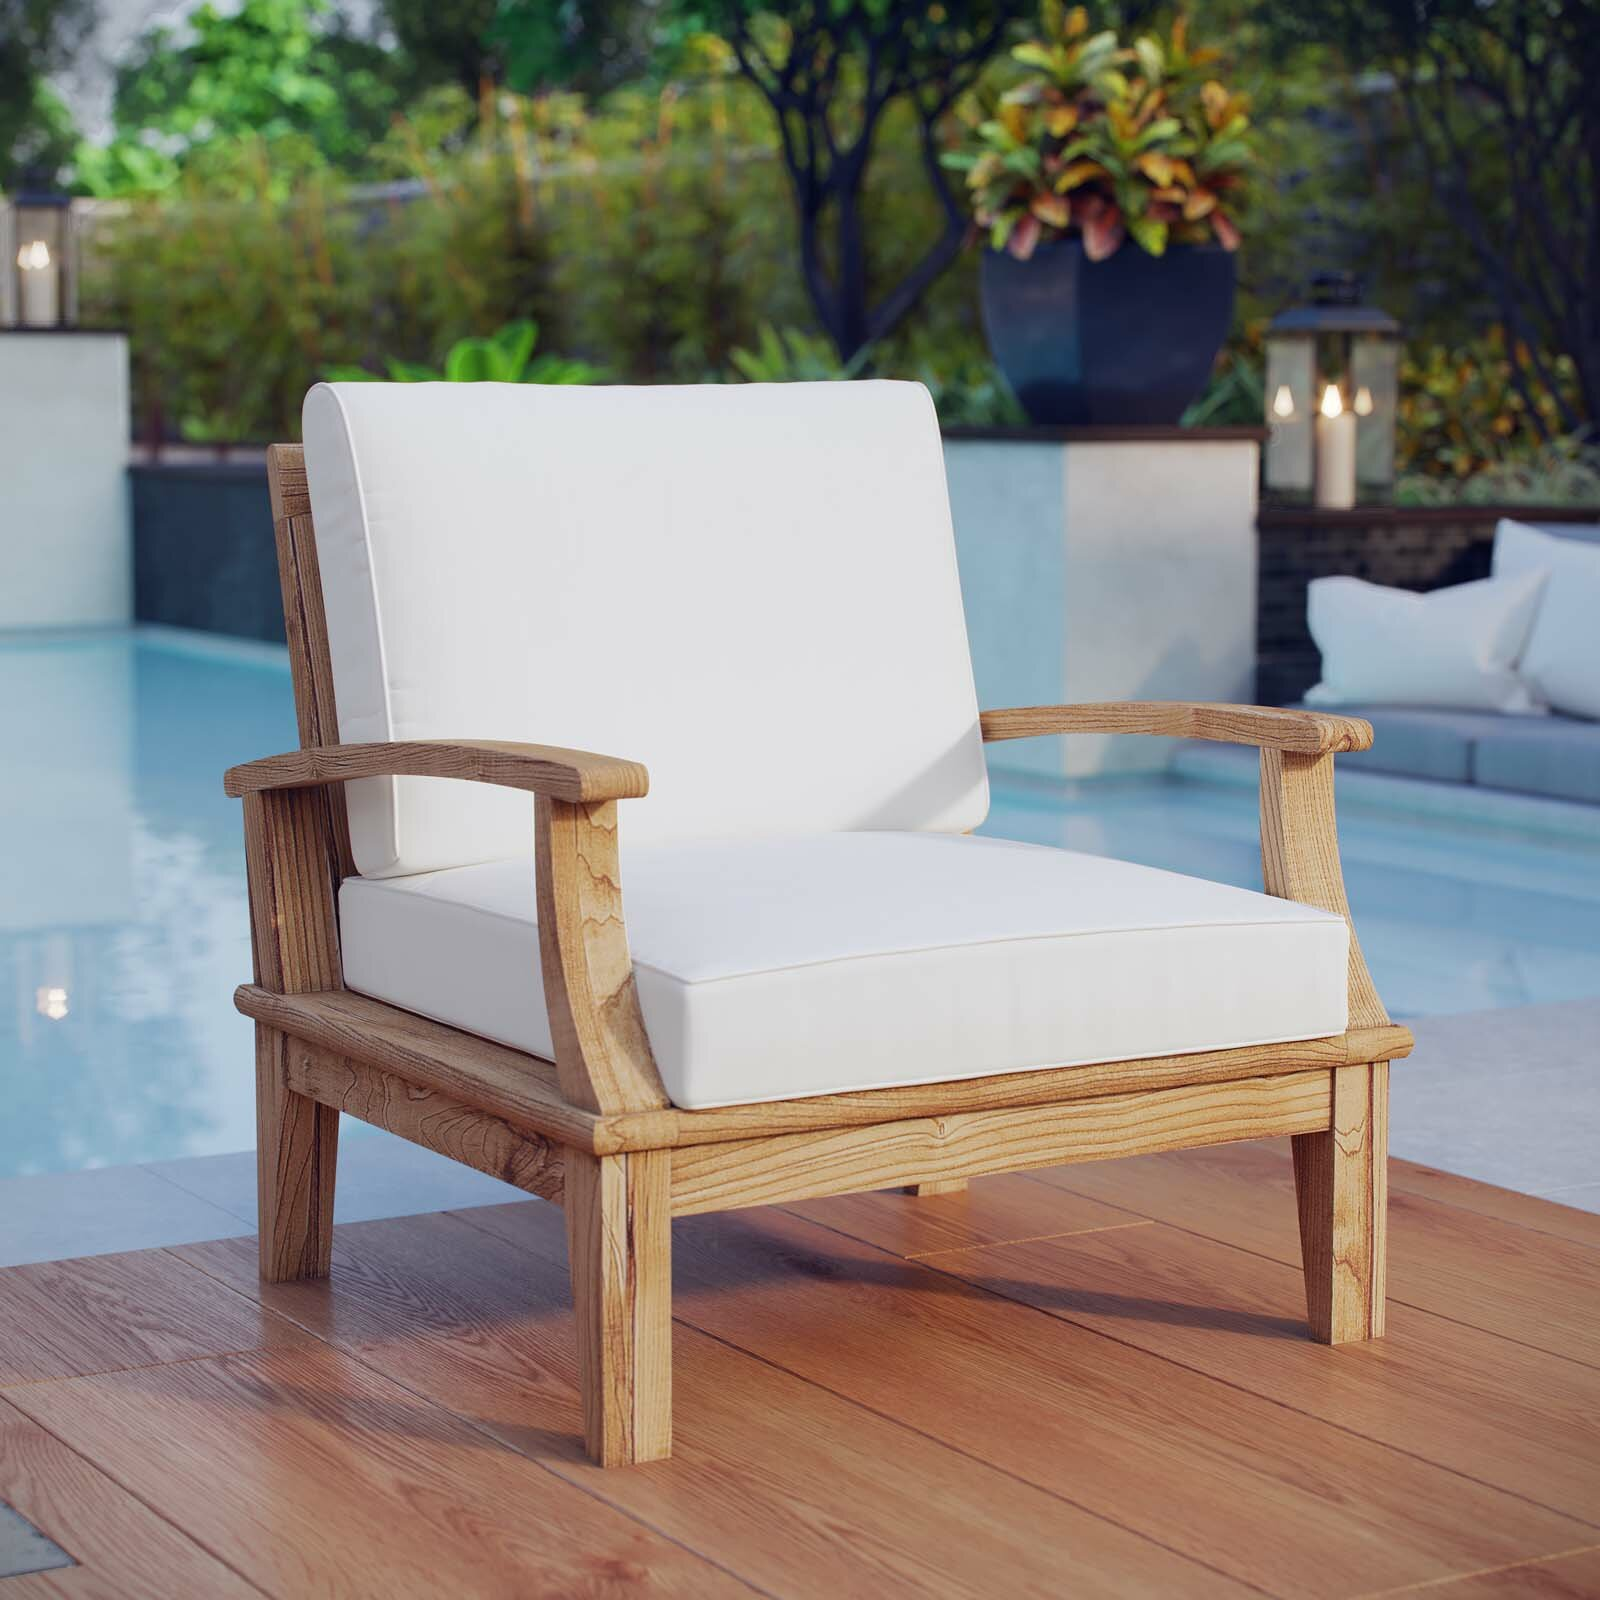 beachcrest home elaina teak patio chair with cushion reviews wayfair rh wayfair com Luxury Teak Outdoor Furniture highest quality teak outdoor furniture